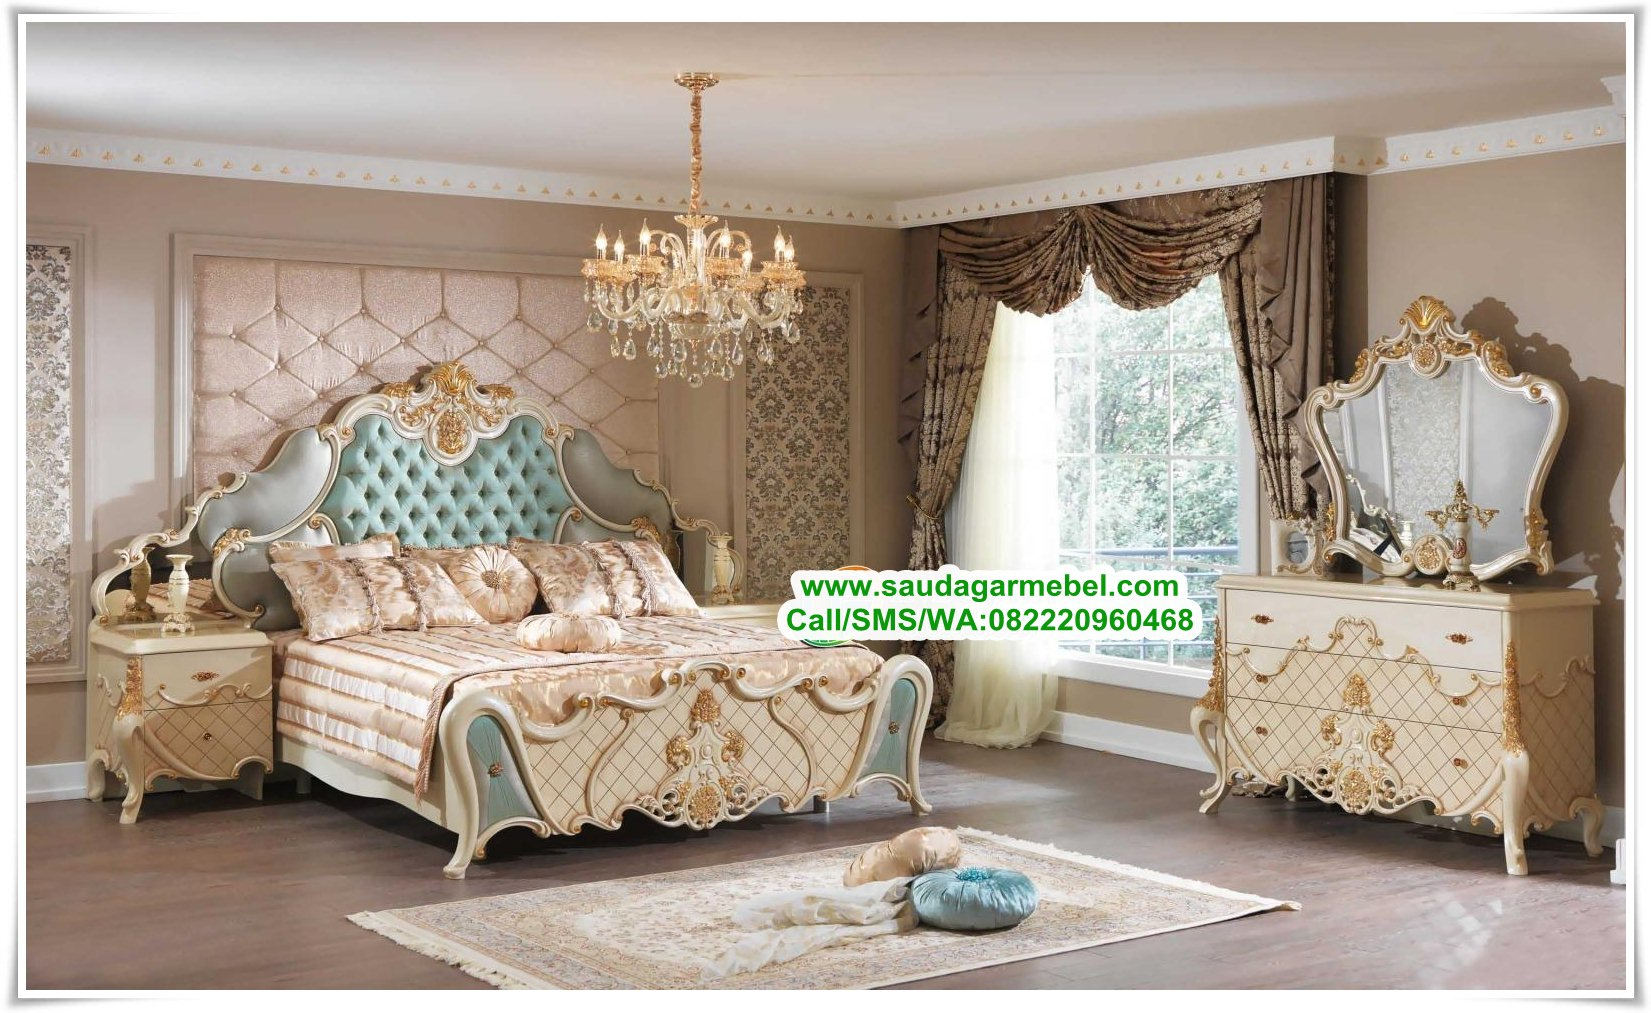 kamar set mewah ukiran eropa, tempat tidur eropa, kamar set mewah olivia Terbaru, set tempat tidur mewah , kamar klasik modern, desain kamar set modern, desain kamar set jepara, gambar tempat tidur minimalis terbaru, kamar set minimalis, kamar set anak, kamar set, dipan,tempat tidur minimalis, tempat tidur, bed room set, set tempat tidur, dipan minimalis,gambar dipan, model tempat tidur minimalis, sofa bed, tempat tidur jati, tempat tidur kayu, ranjang kayu, dipan jati, dipan kayu, tempat tidur jepara, dipan jati minimalis, set kamar tidur, tempat tidur dari kayu, tempat tidur kayu jati, ranjang tidur, tempat tidur jati minimalis, tempat tidur kayu minimalis, tempat tidur terbaru, tempat tidur minimalis murah, model tempat tidur terbaru, model tempat tidur kayu, bed set minimalis, jual tempat tidur minimalis, model tempat tidur minimalis terbaru, set kamar tidur minimalis, modeldipan minimalis, kamar tidur set, furniture jepara, olympic furniture, toko furniture, furniture jati, mebel jati, mebel jepara,saudagar mebel, desain interior, desain kamar set jepara, gambar tempat tidur minimalis terbaru, kamar set kalsik modern, model tempat tidur terbaru, ranjang tidur, tempat tidur dari kayu, tempat tidur jati minimalis, tempat tidur kayu jati, tempat tidur kayu minimalis, mebel minimalis, furniture jepara, furniture kalimantan, furniture pontianak, furniture palembang, furniture medan, furniture jakarta